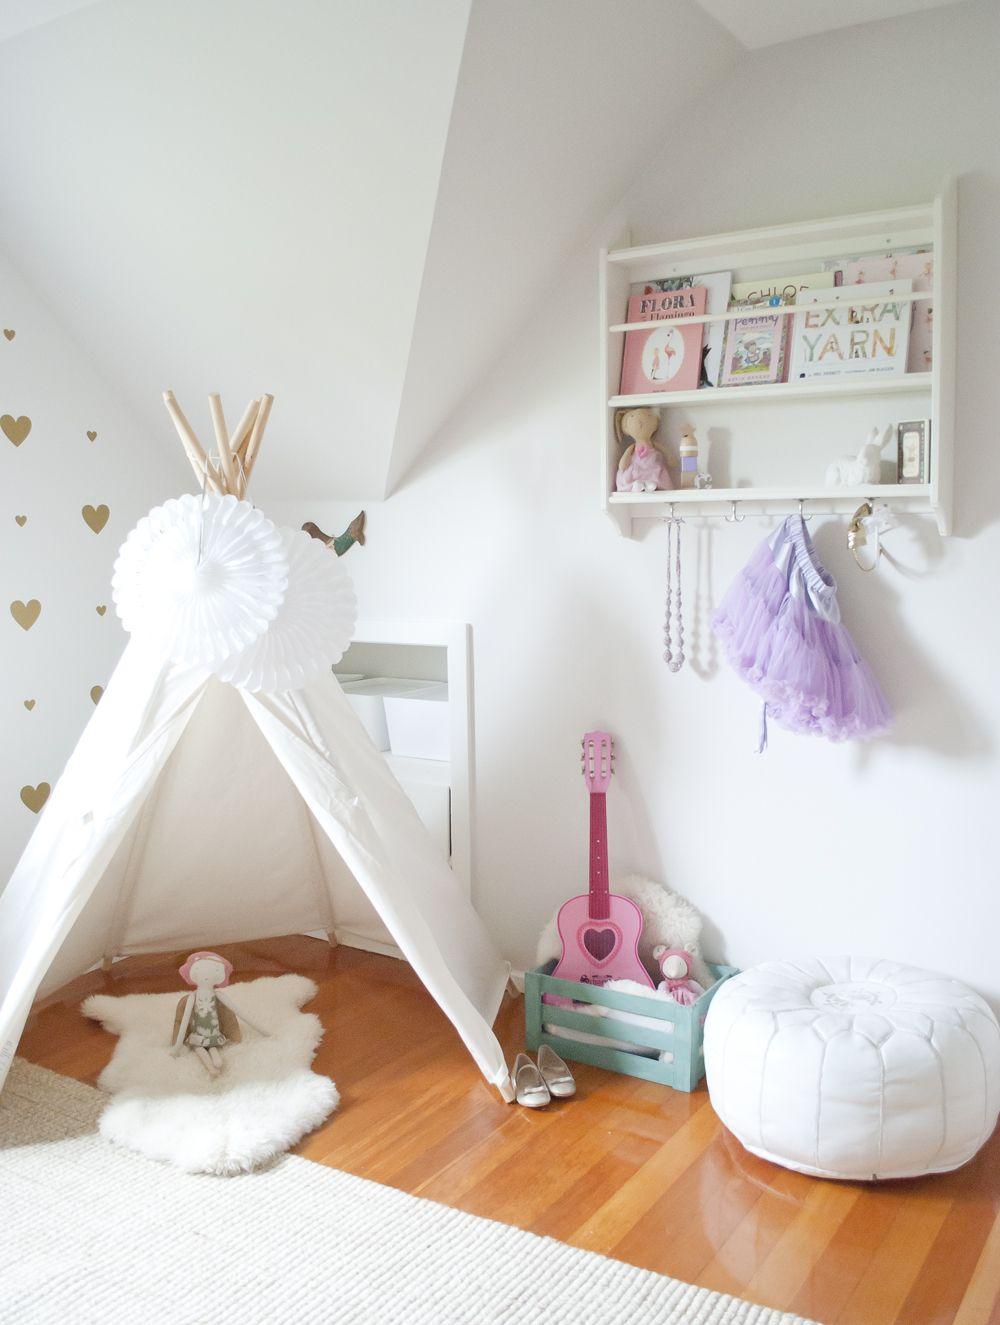 Bedroom For Girl Interior Design Chloe's Big Girl Bedroom  Room Interior Design Room Interior And